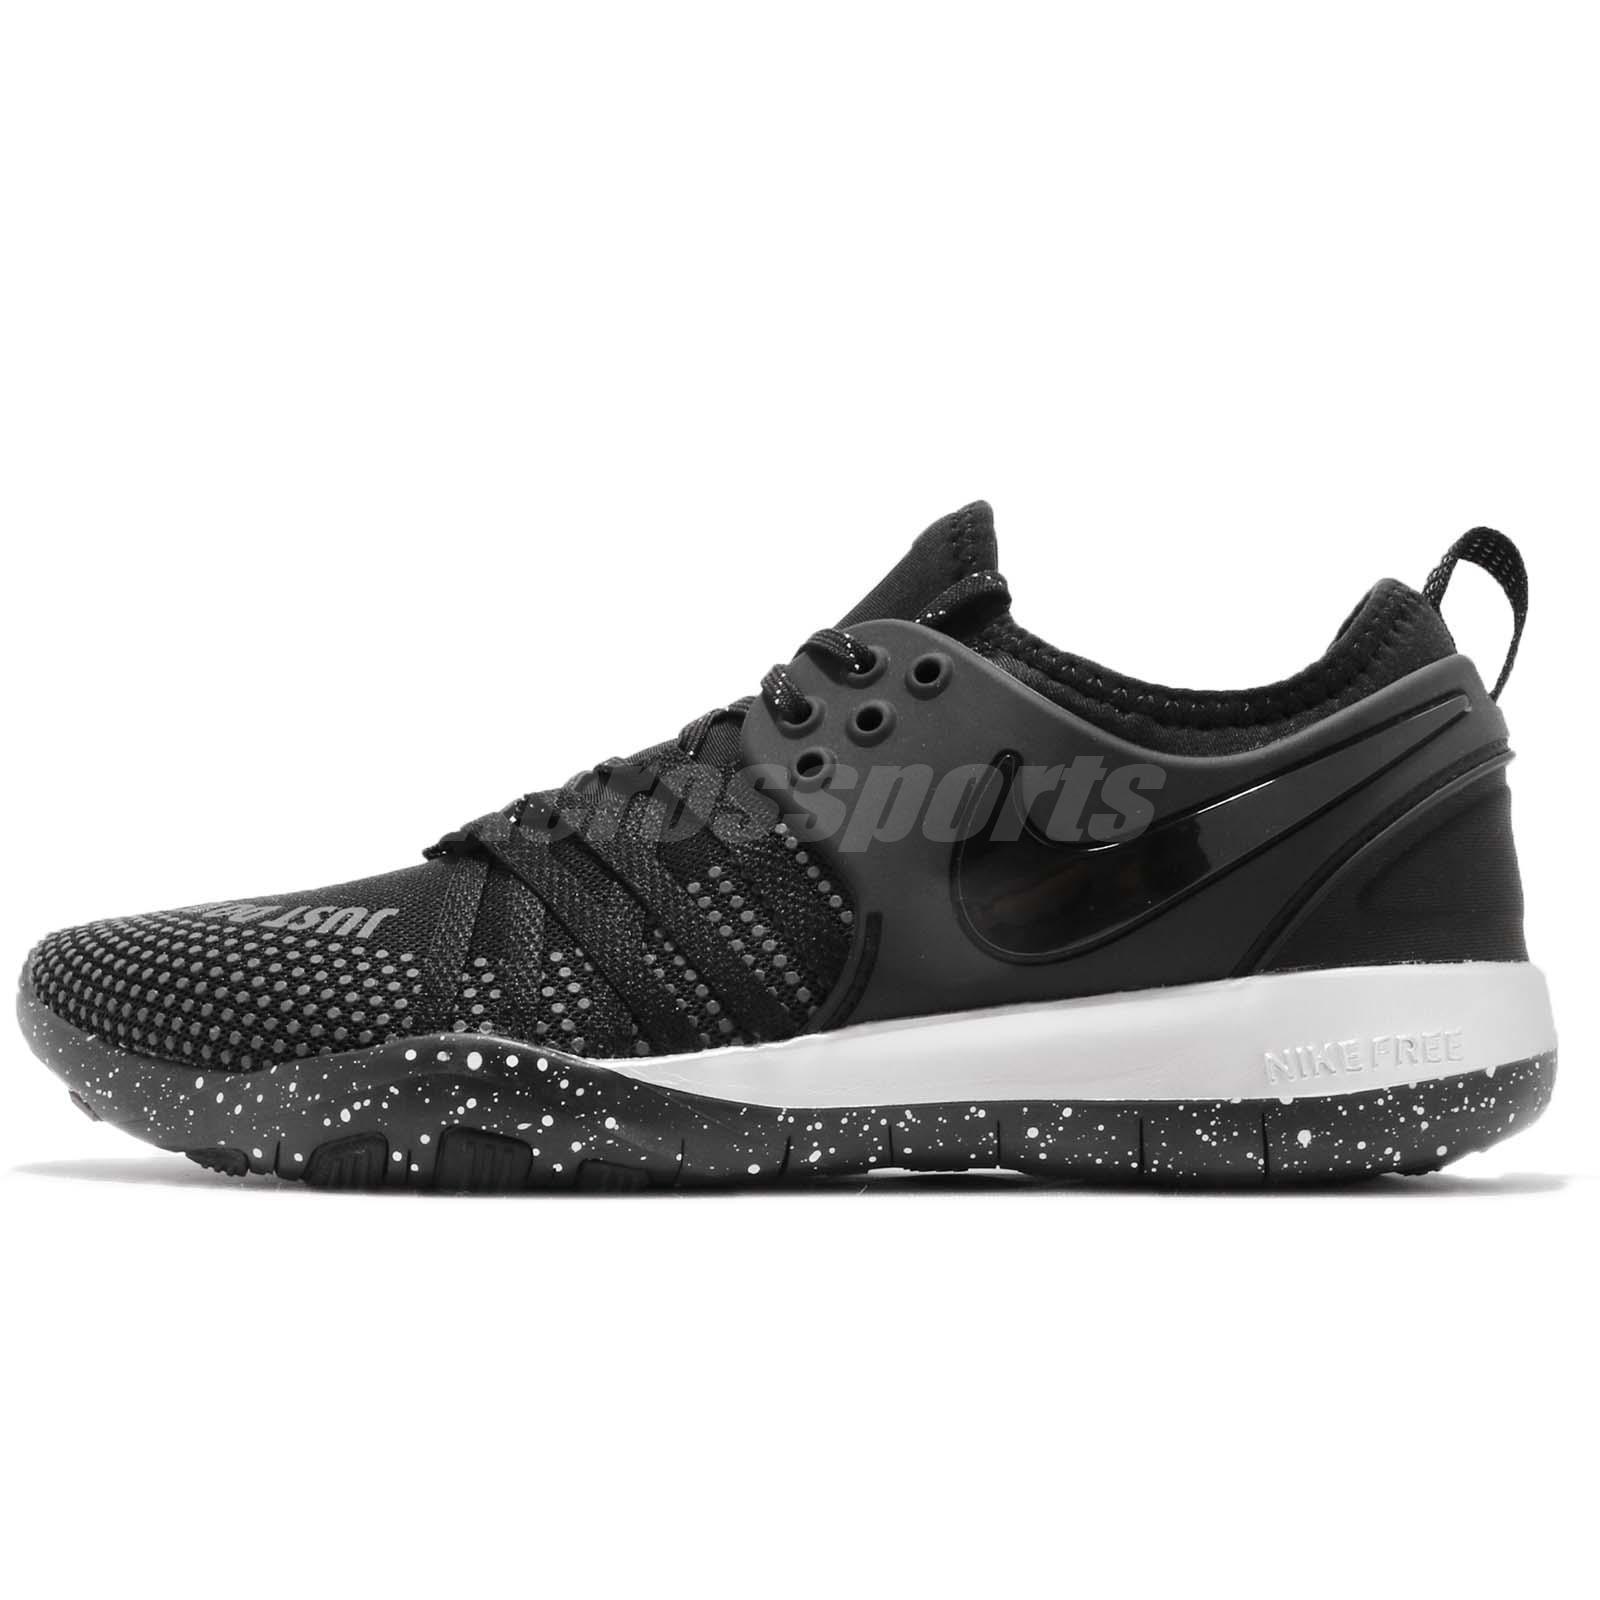 550d0bb809f0 Nike Wmns Free TR 7 Selfie Black Silver Women Cross Training Shoes AH5734- 001